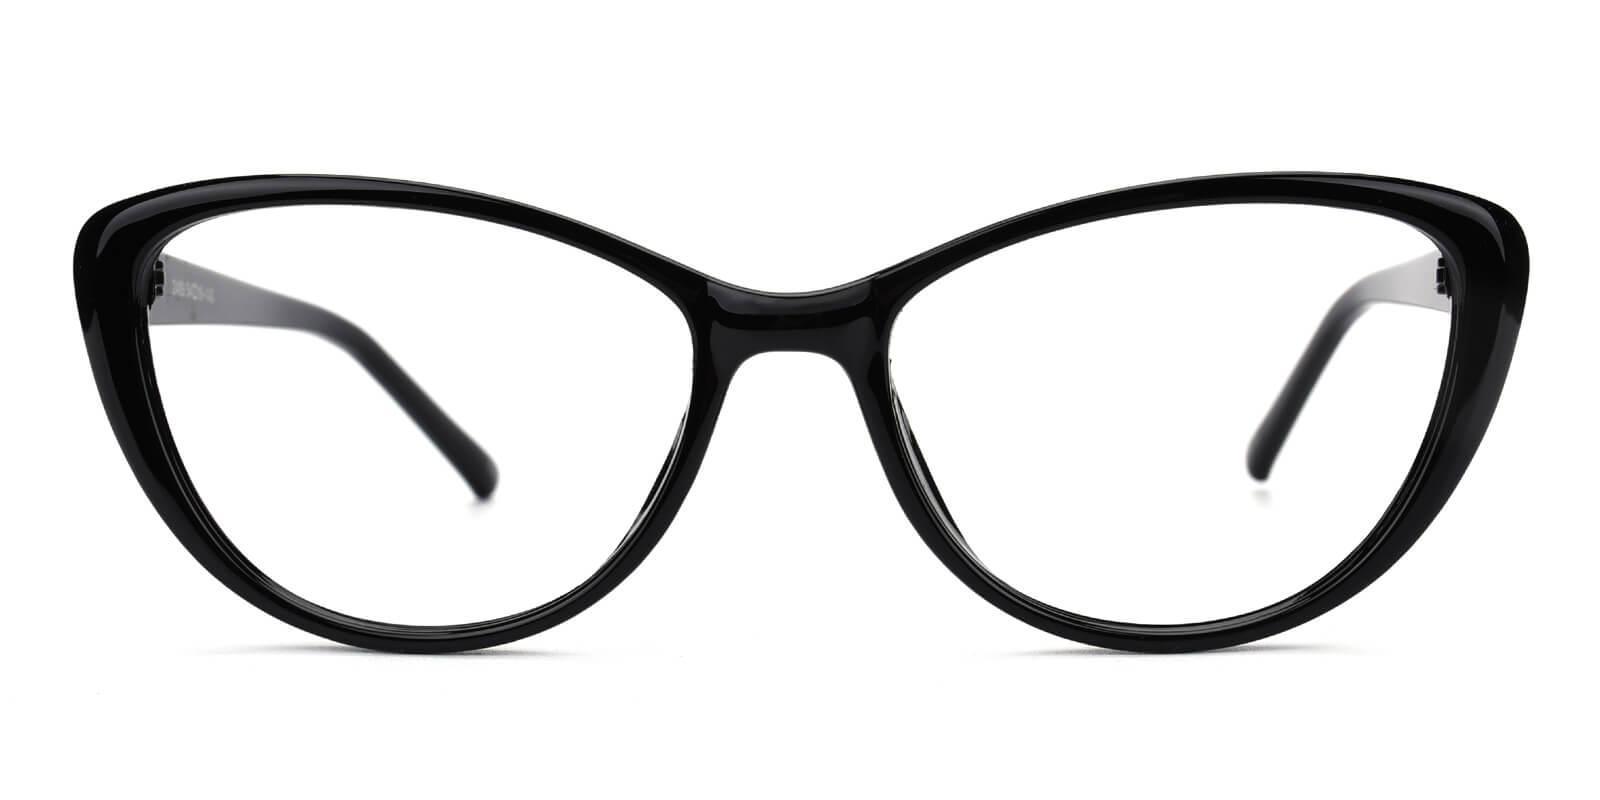 Slackey-Black-Oval / Cat-Acetate-Eyeglasses-additional2